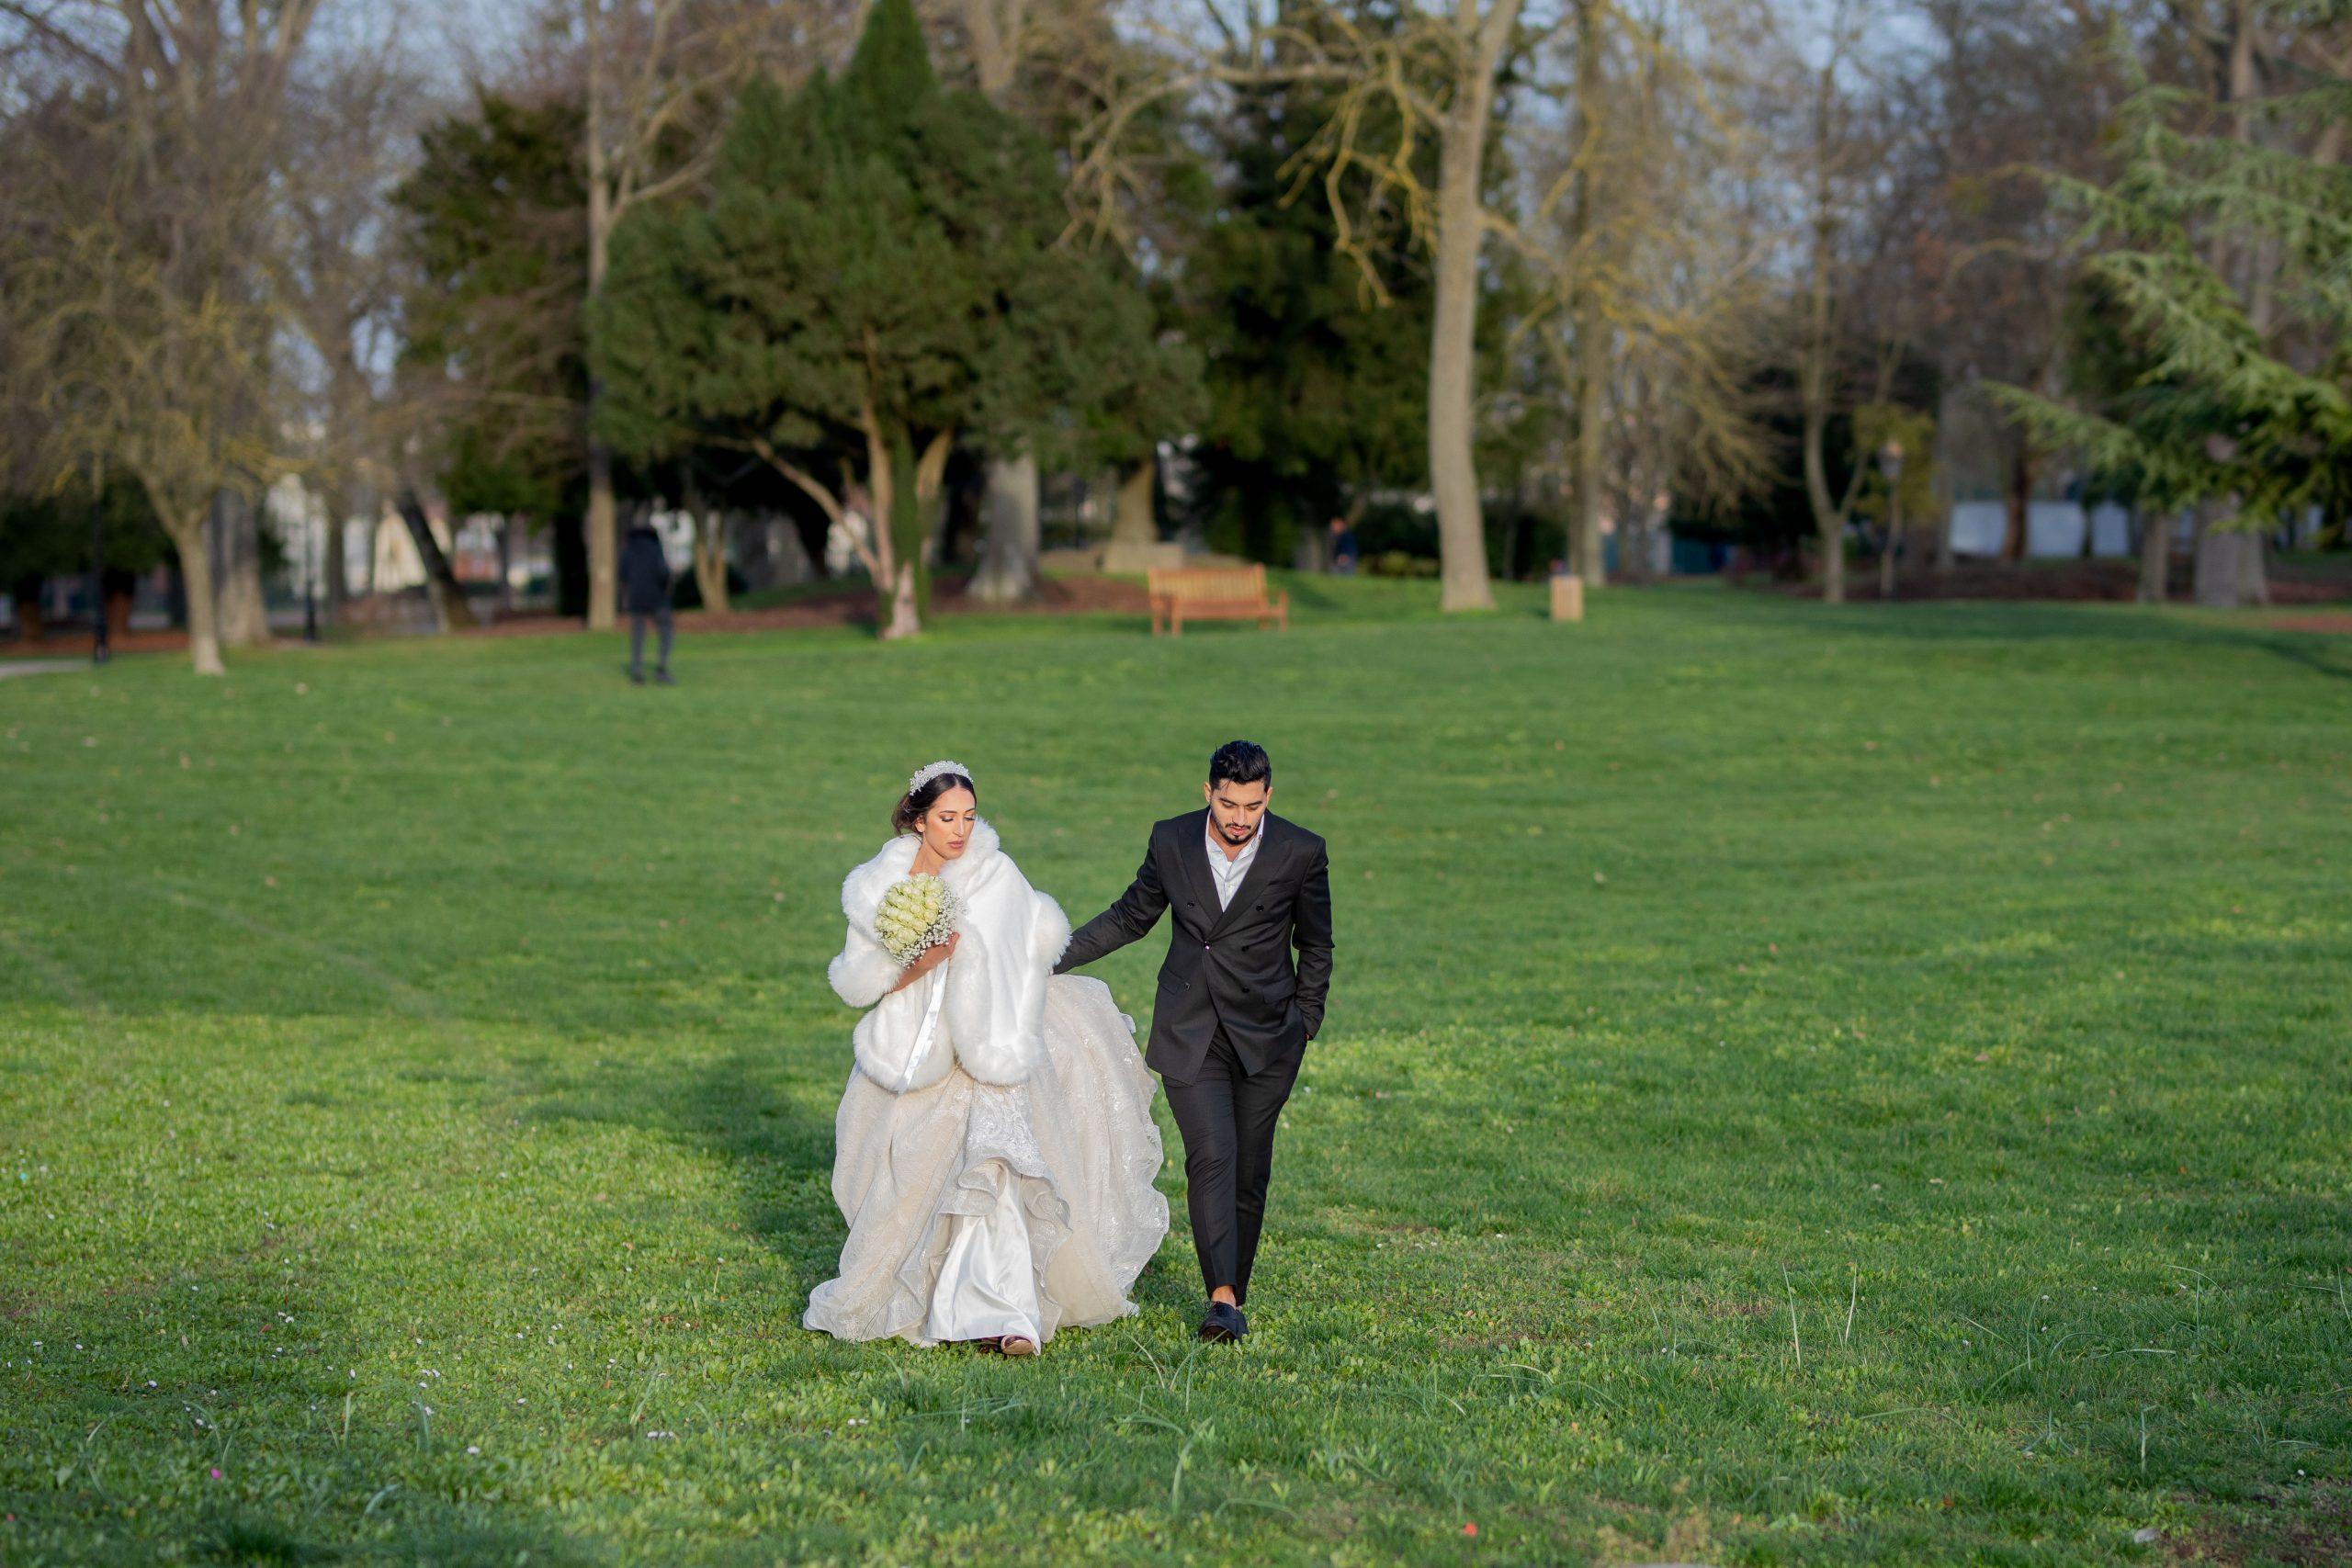 Mariage Ile de France - Photographe Ile de France original - mariage intime - séance couple - Paris